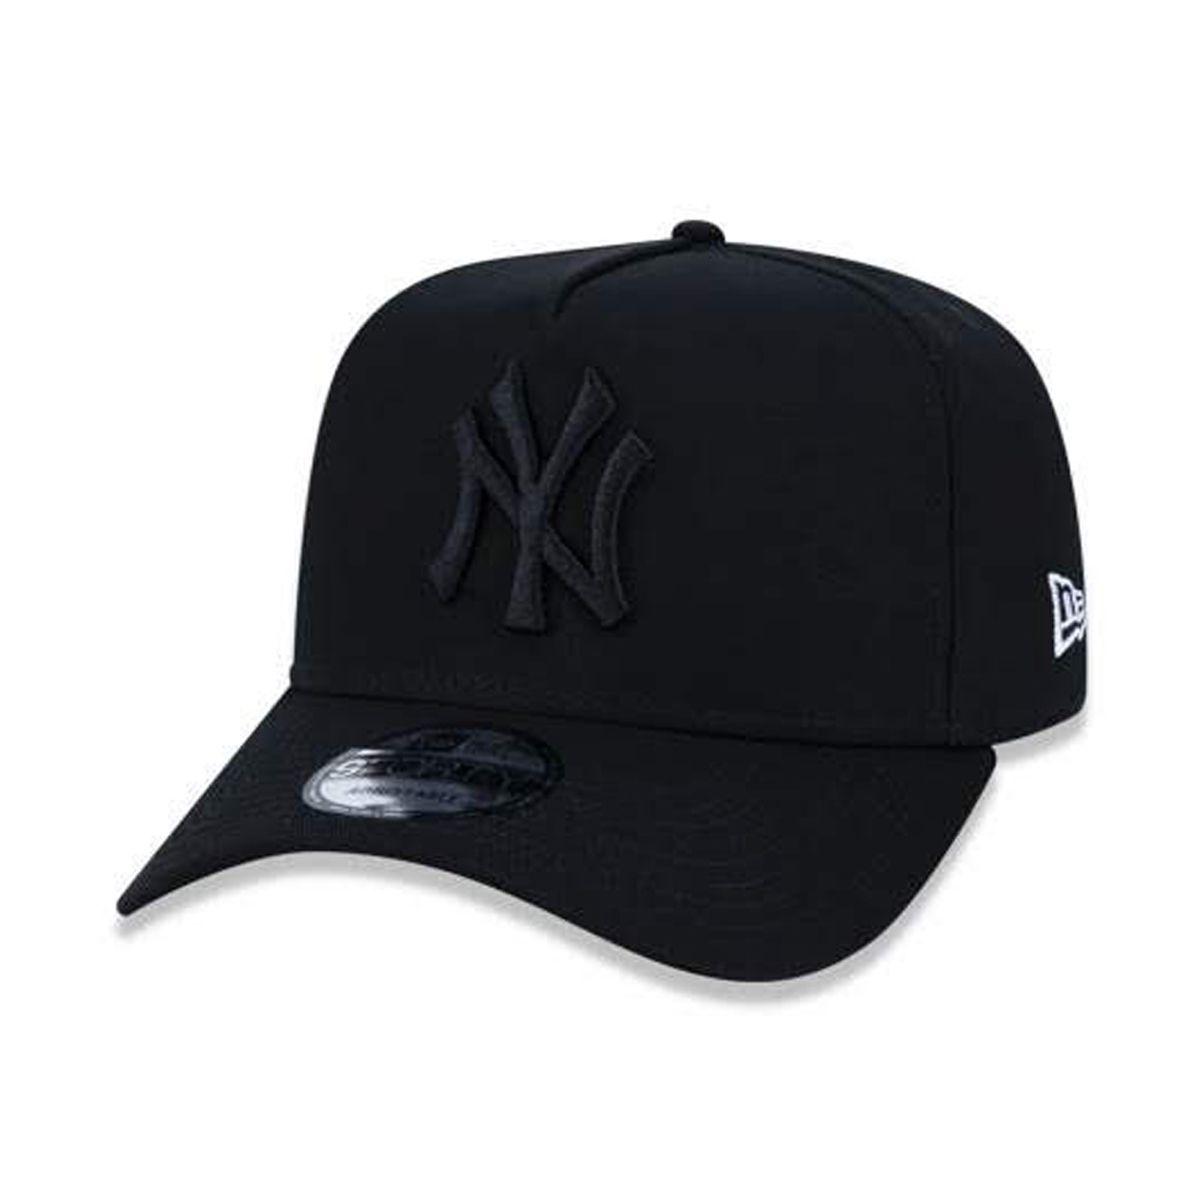 Boné New Era Masculino Yankees Preto